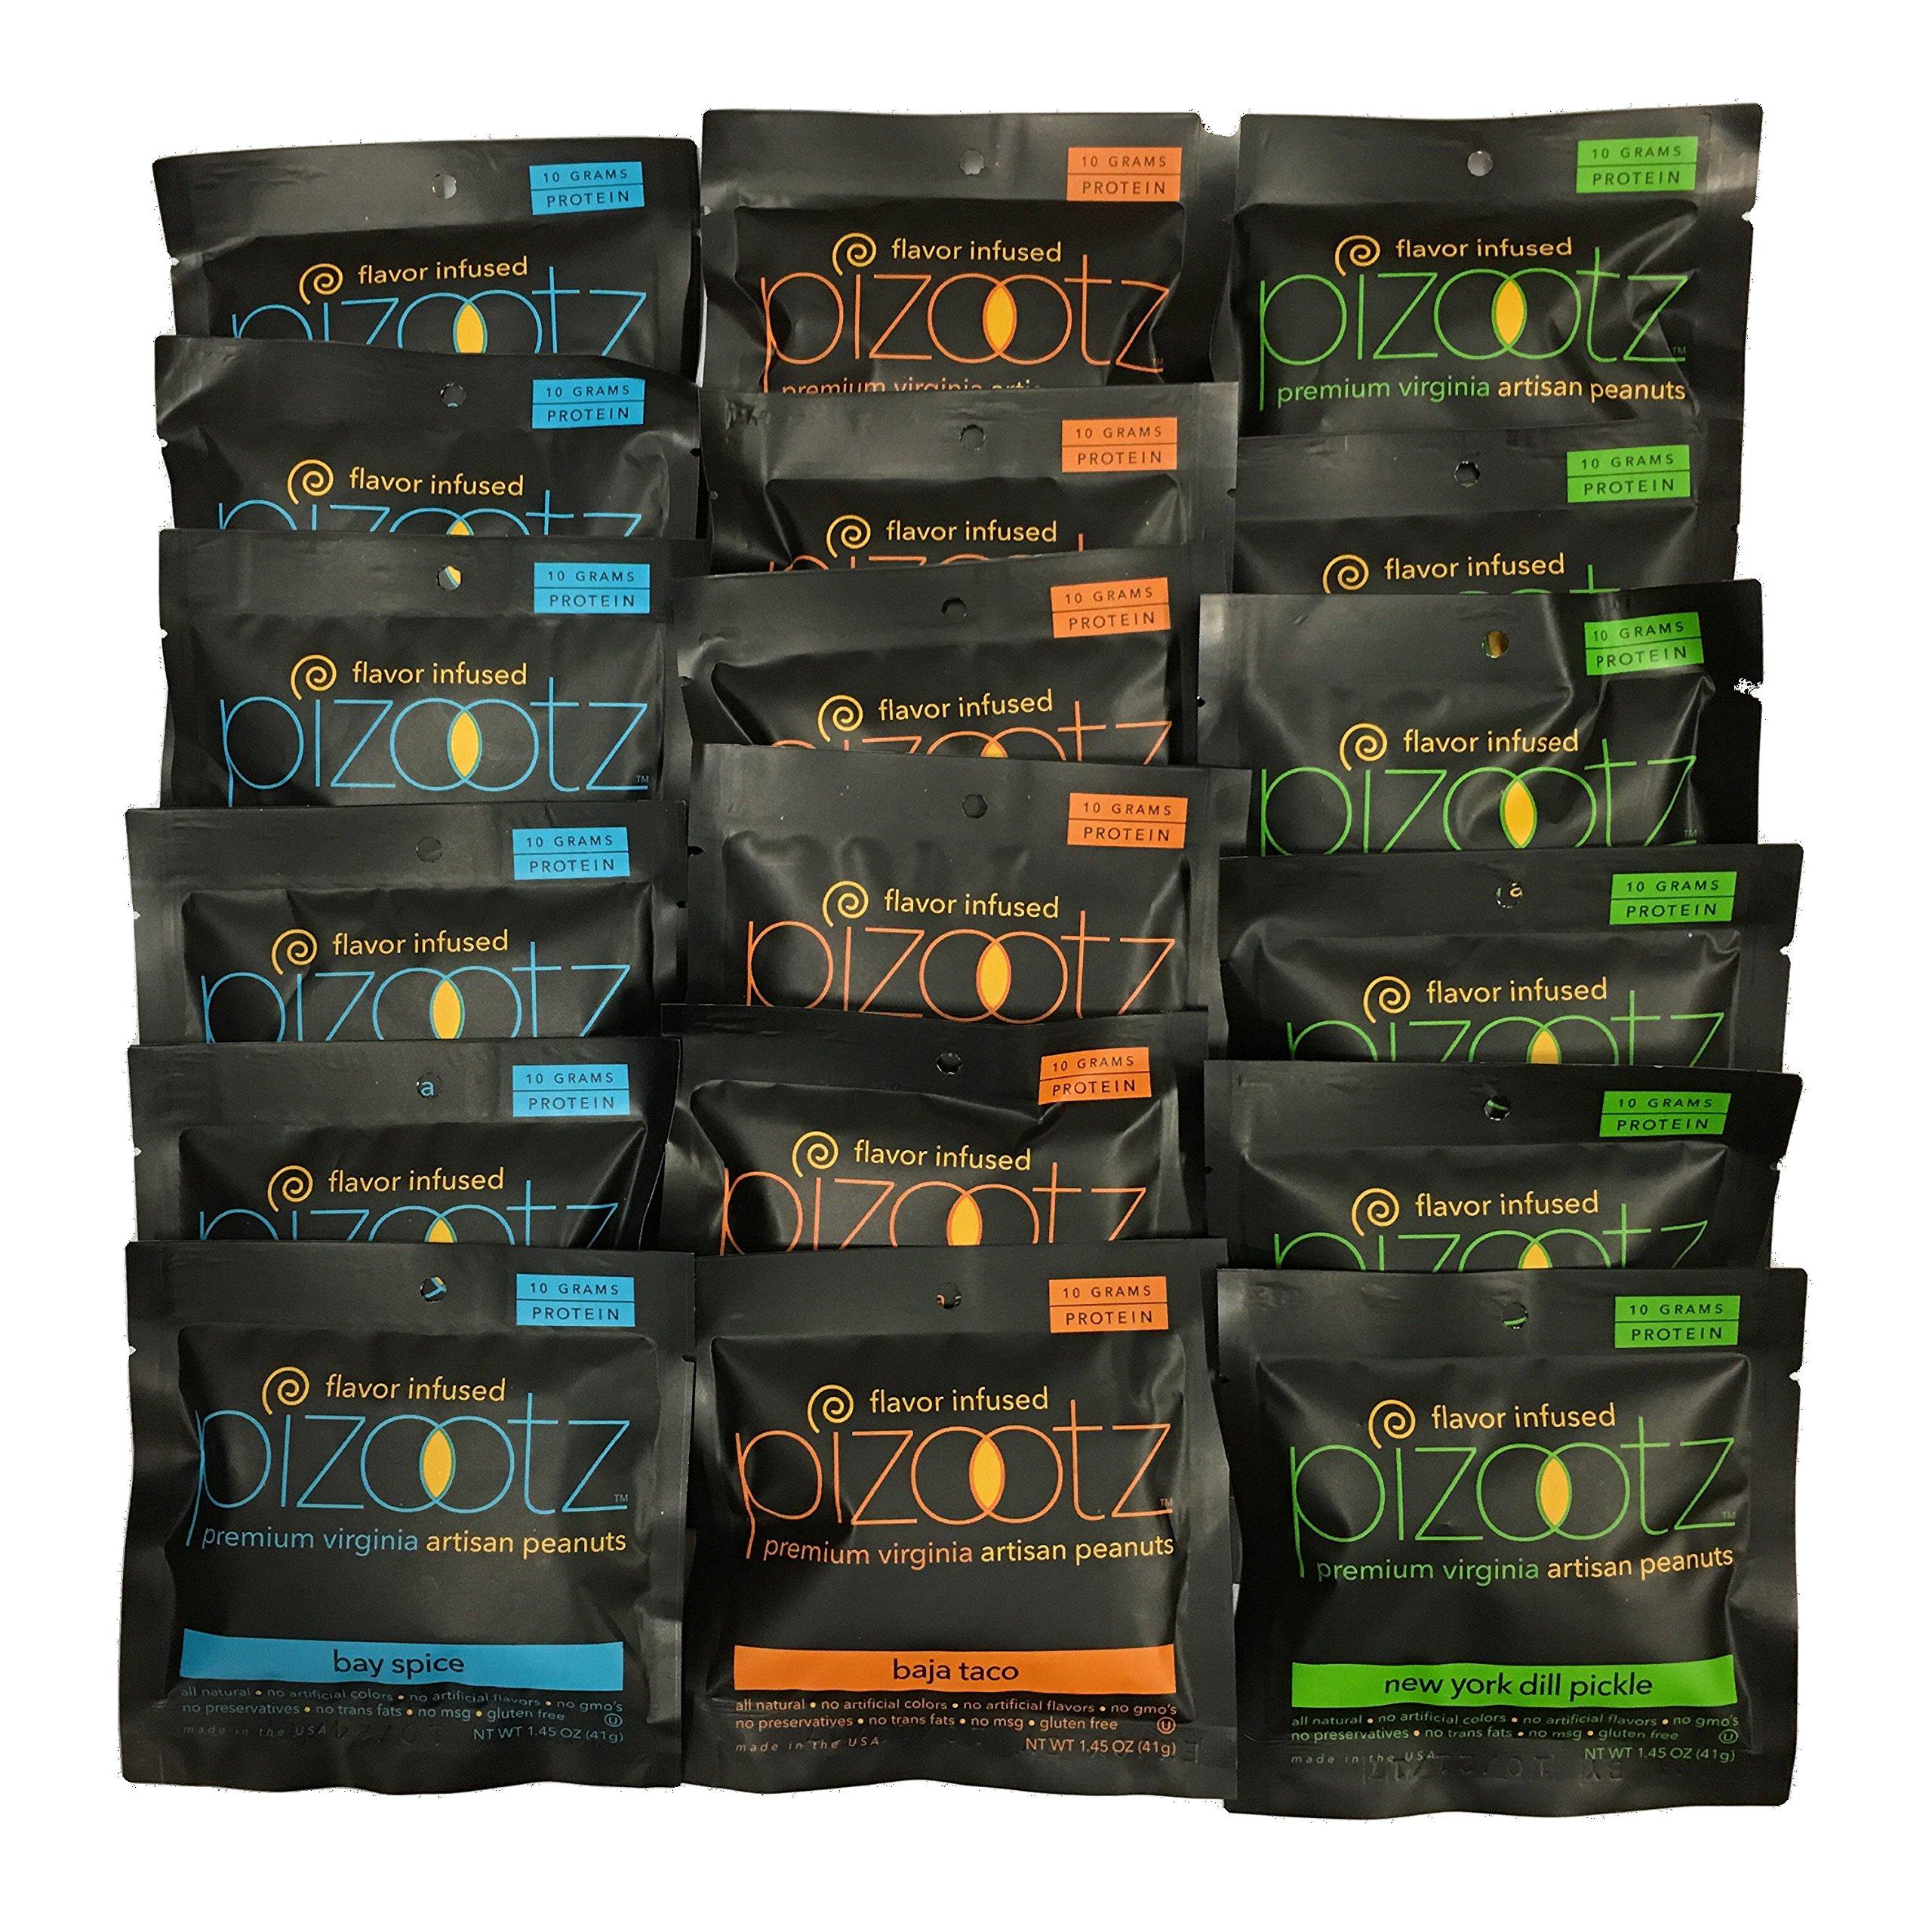 Pizootz Wow Variety Pack- 6 each 1.45 oz New York Dill, Baja Taco, Bay Spice-Flavor Infused Peanuts-Premium Virginia Gourmet Artisan Vegan Peanuts - (18) 1.45 oz bags